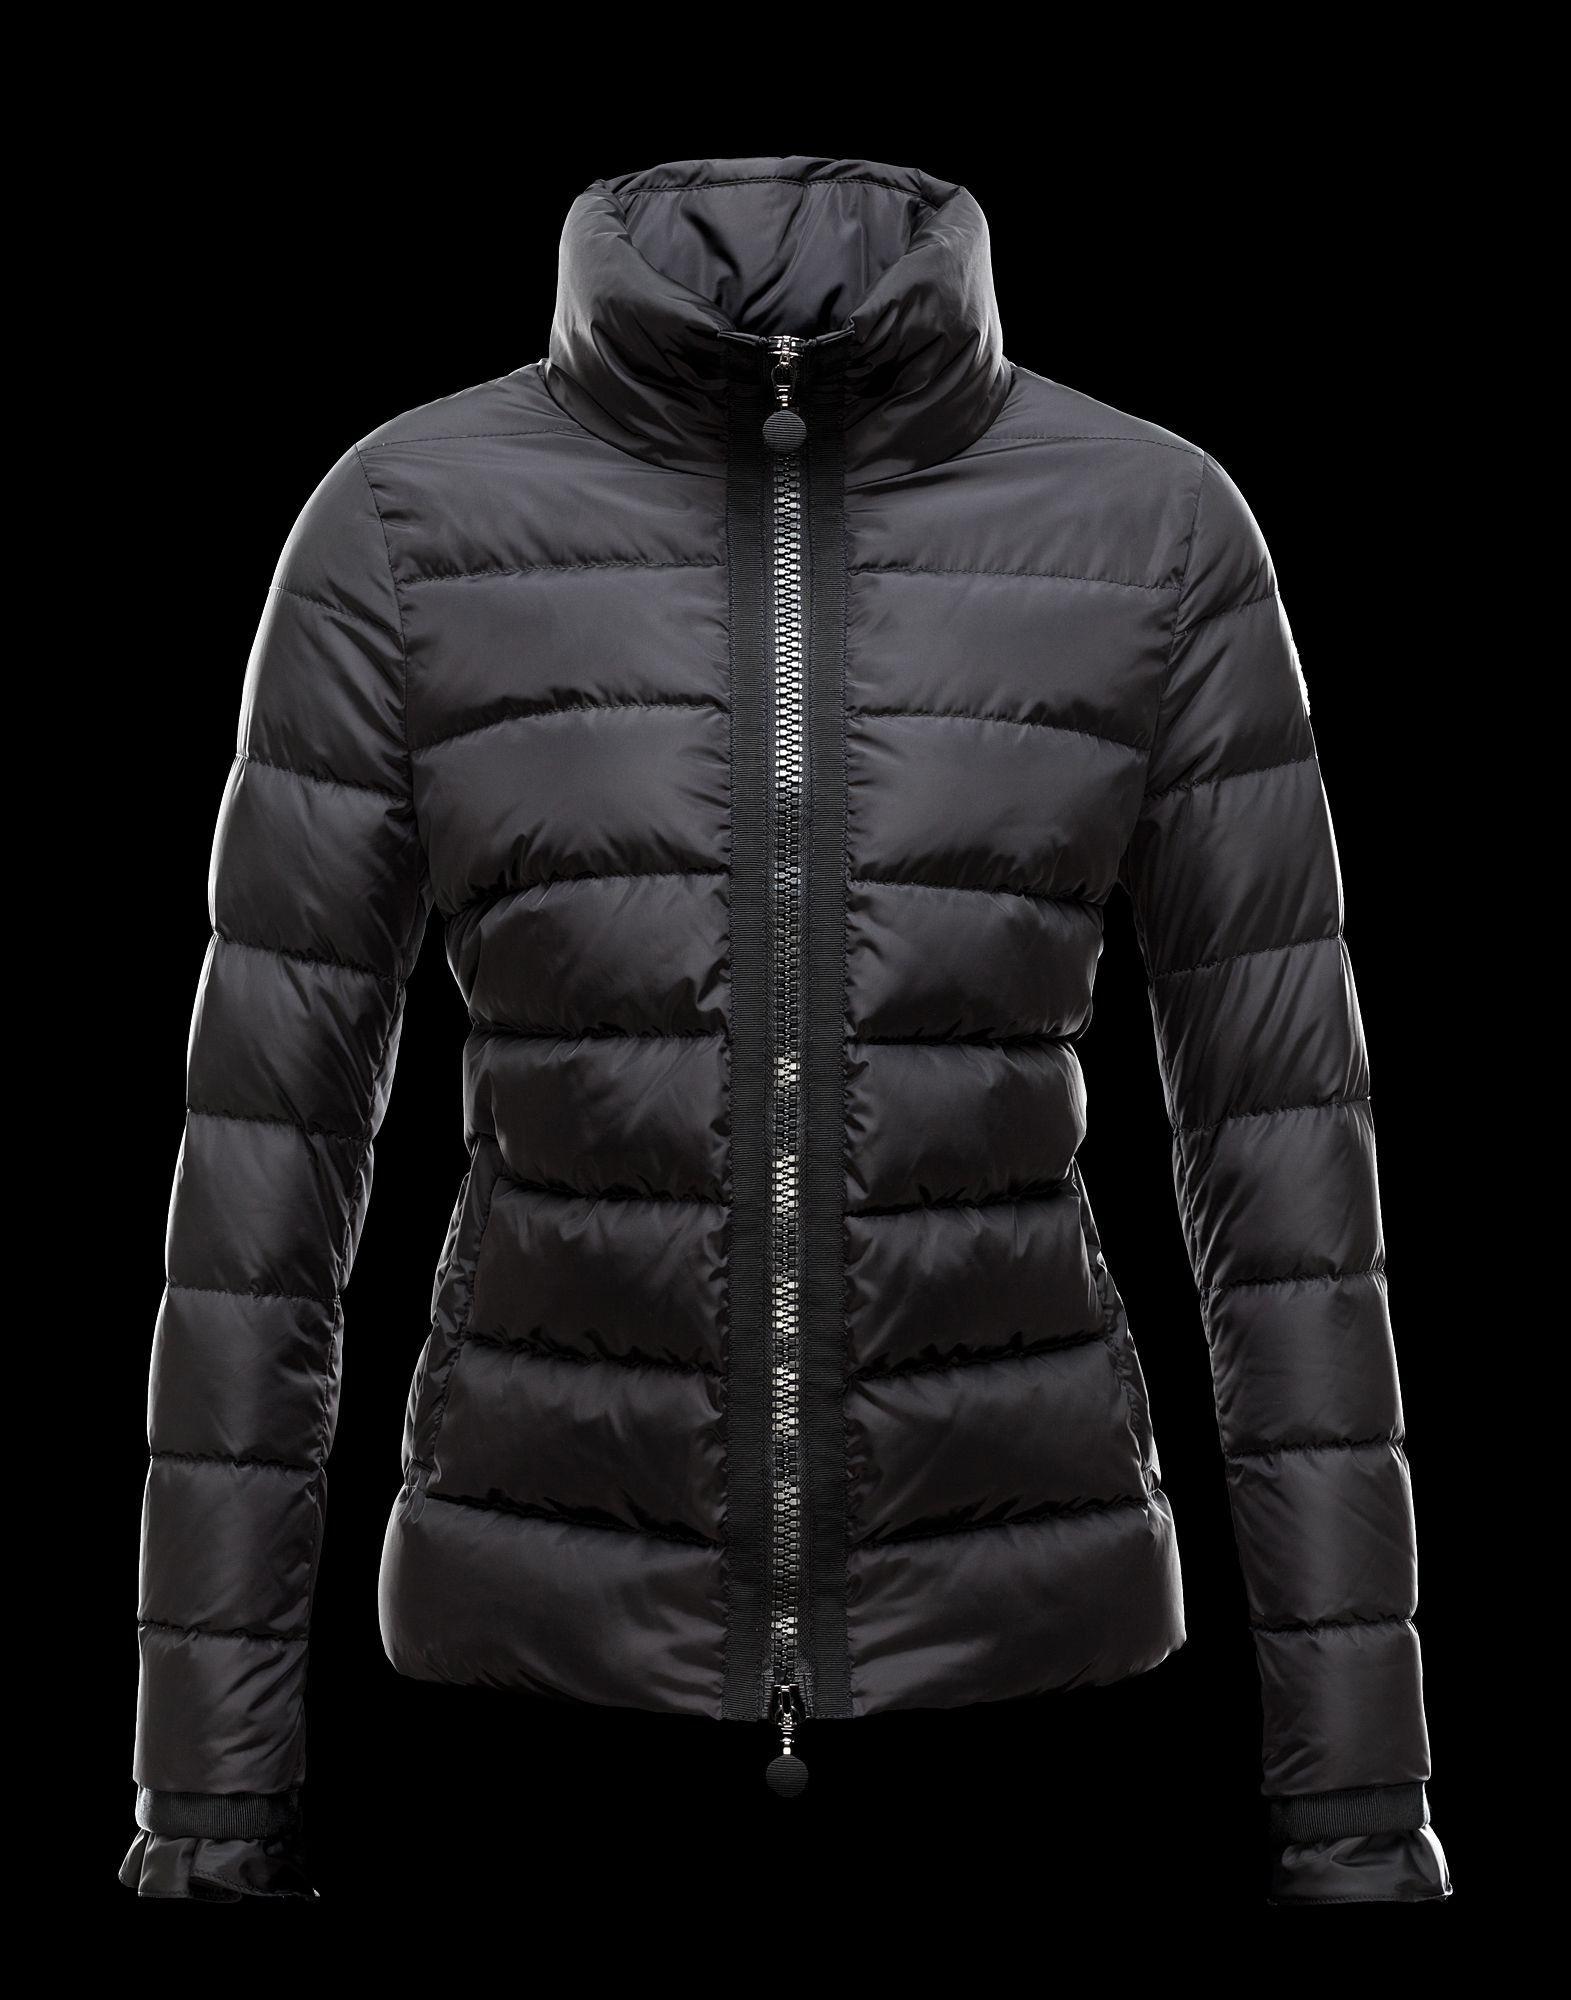 Moncler Winter jackets women, Ski jacket, Winter jackets